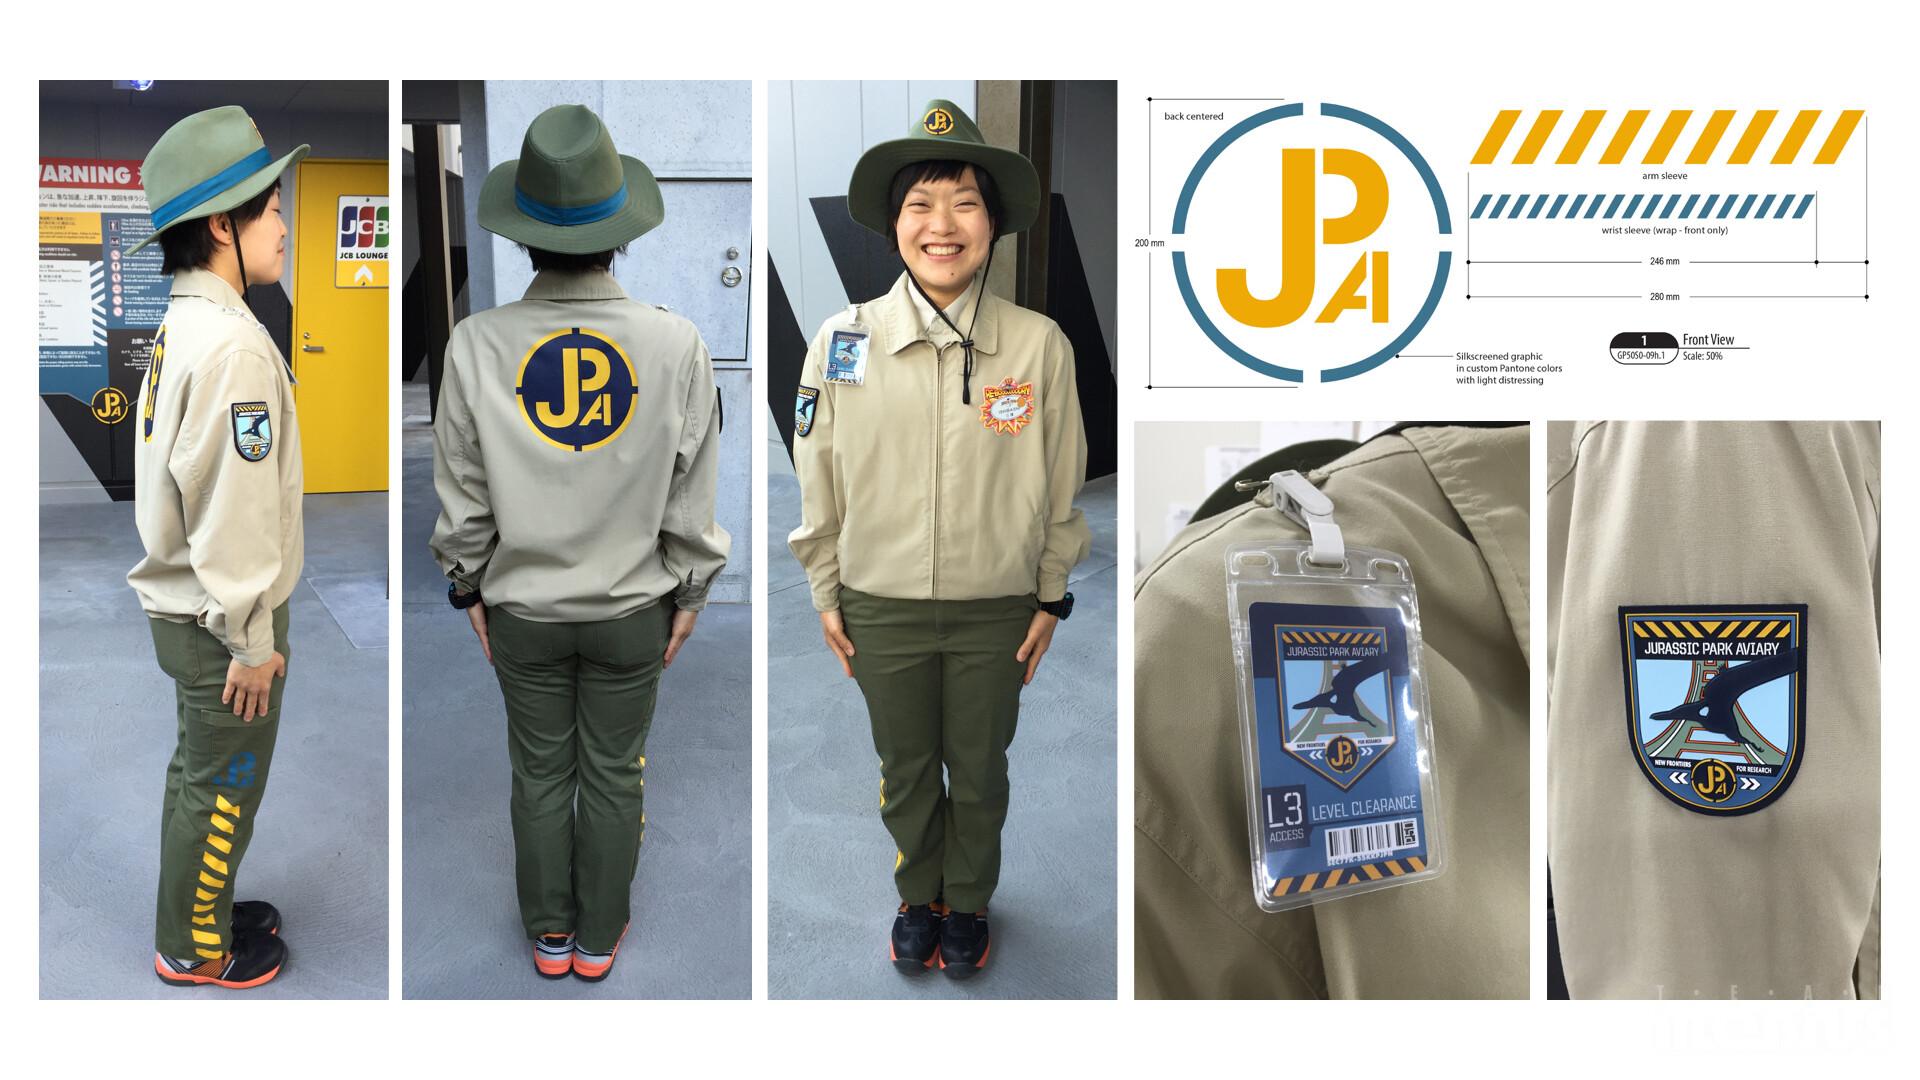 Production Photo of Operation Uniform